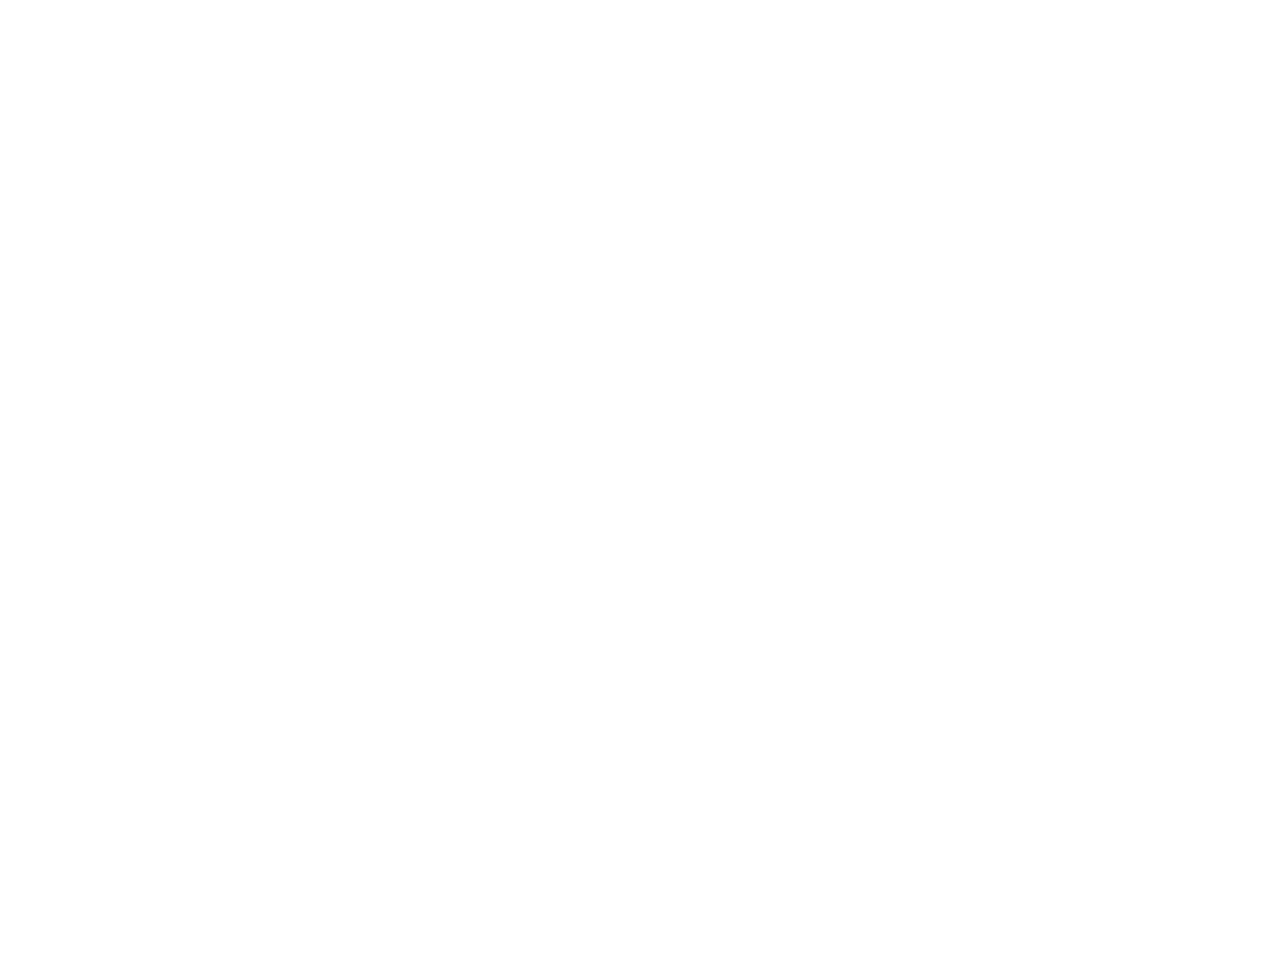 Webthumbnail weibo.com